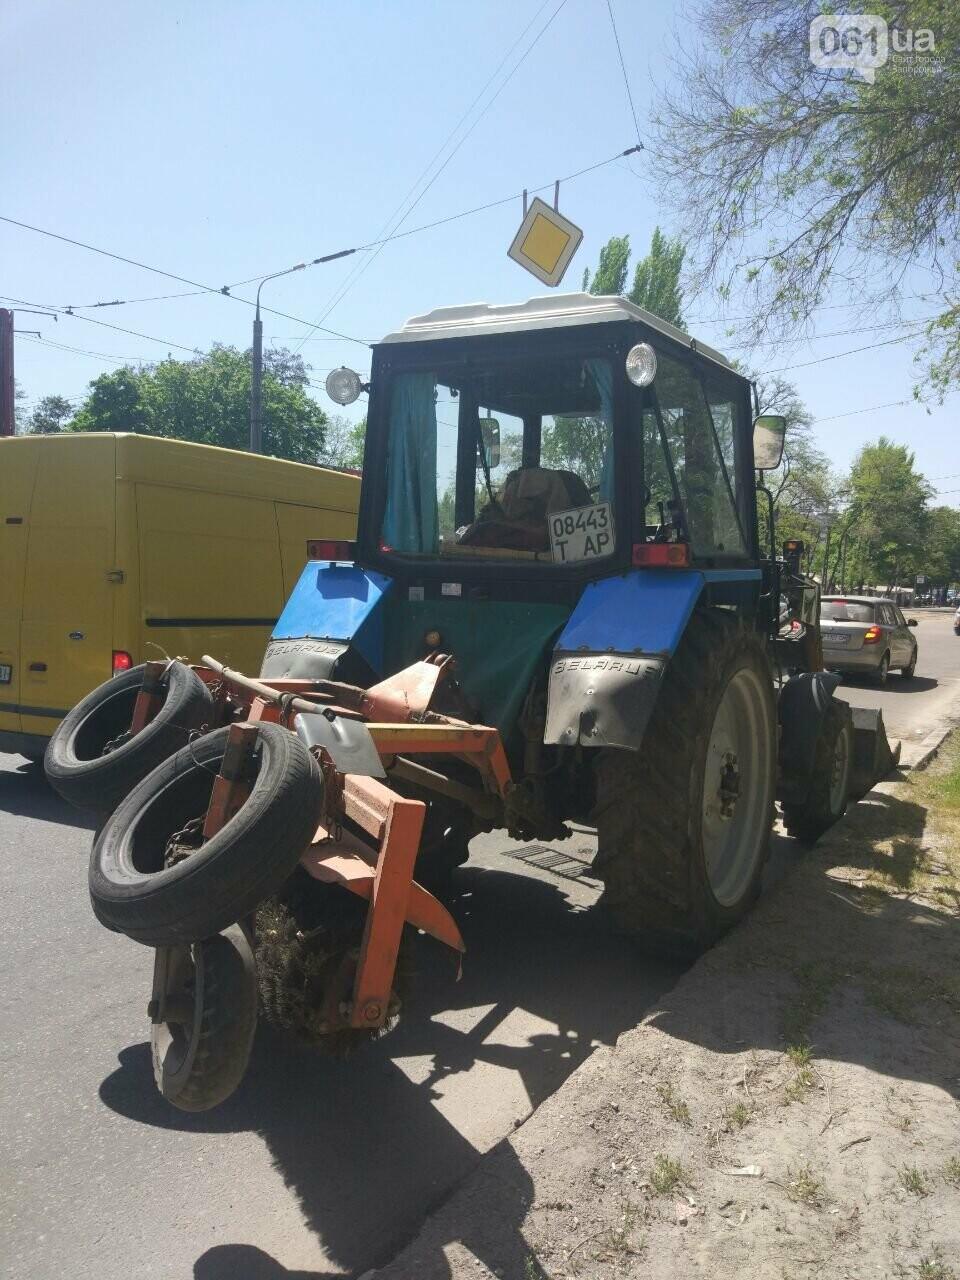 В Запорожье трактор въехал в припаркованное авто, - ФОТО, фото-1